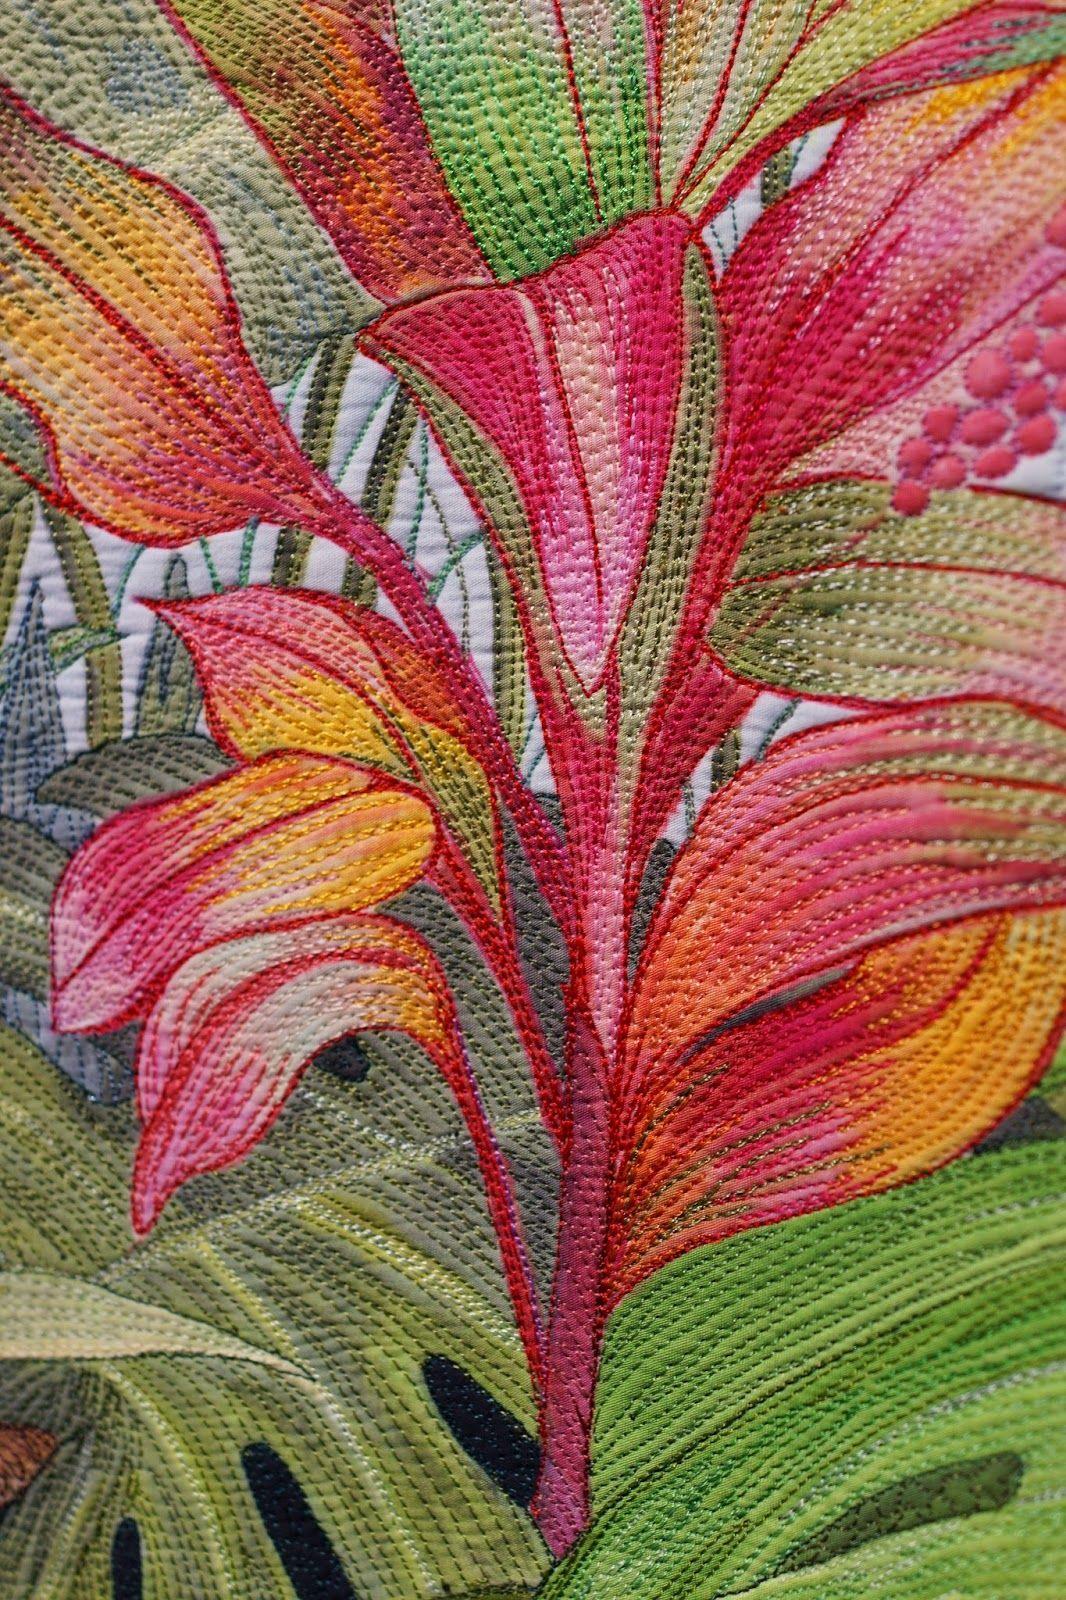 Martha Wolfe Quilt Symposium Manawatu 2015 Landscape Art Quilts Flower Quilts Art Quilts